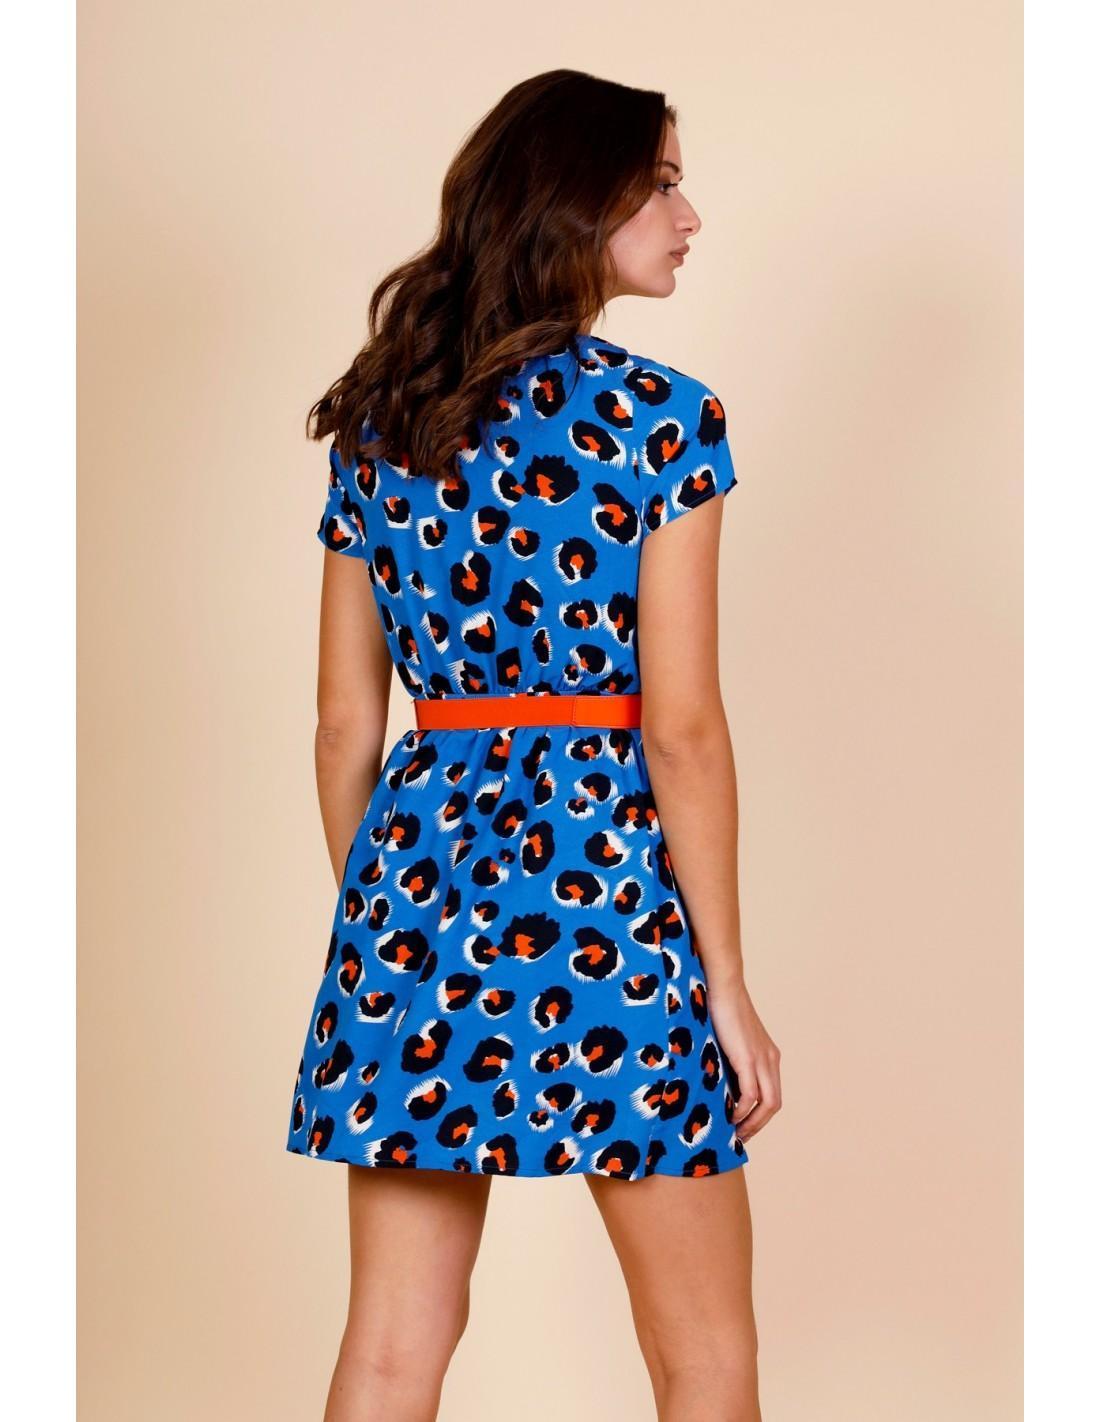 BLUE LEO DRESS MINUETO